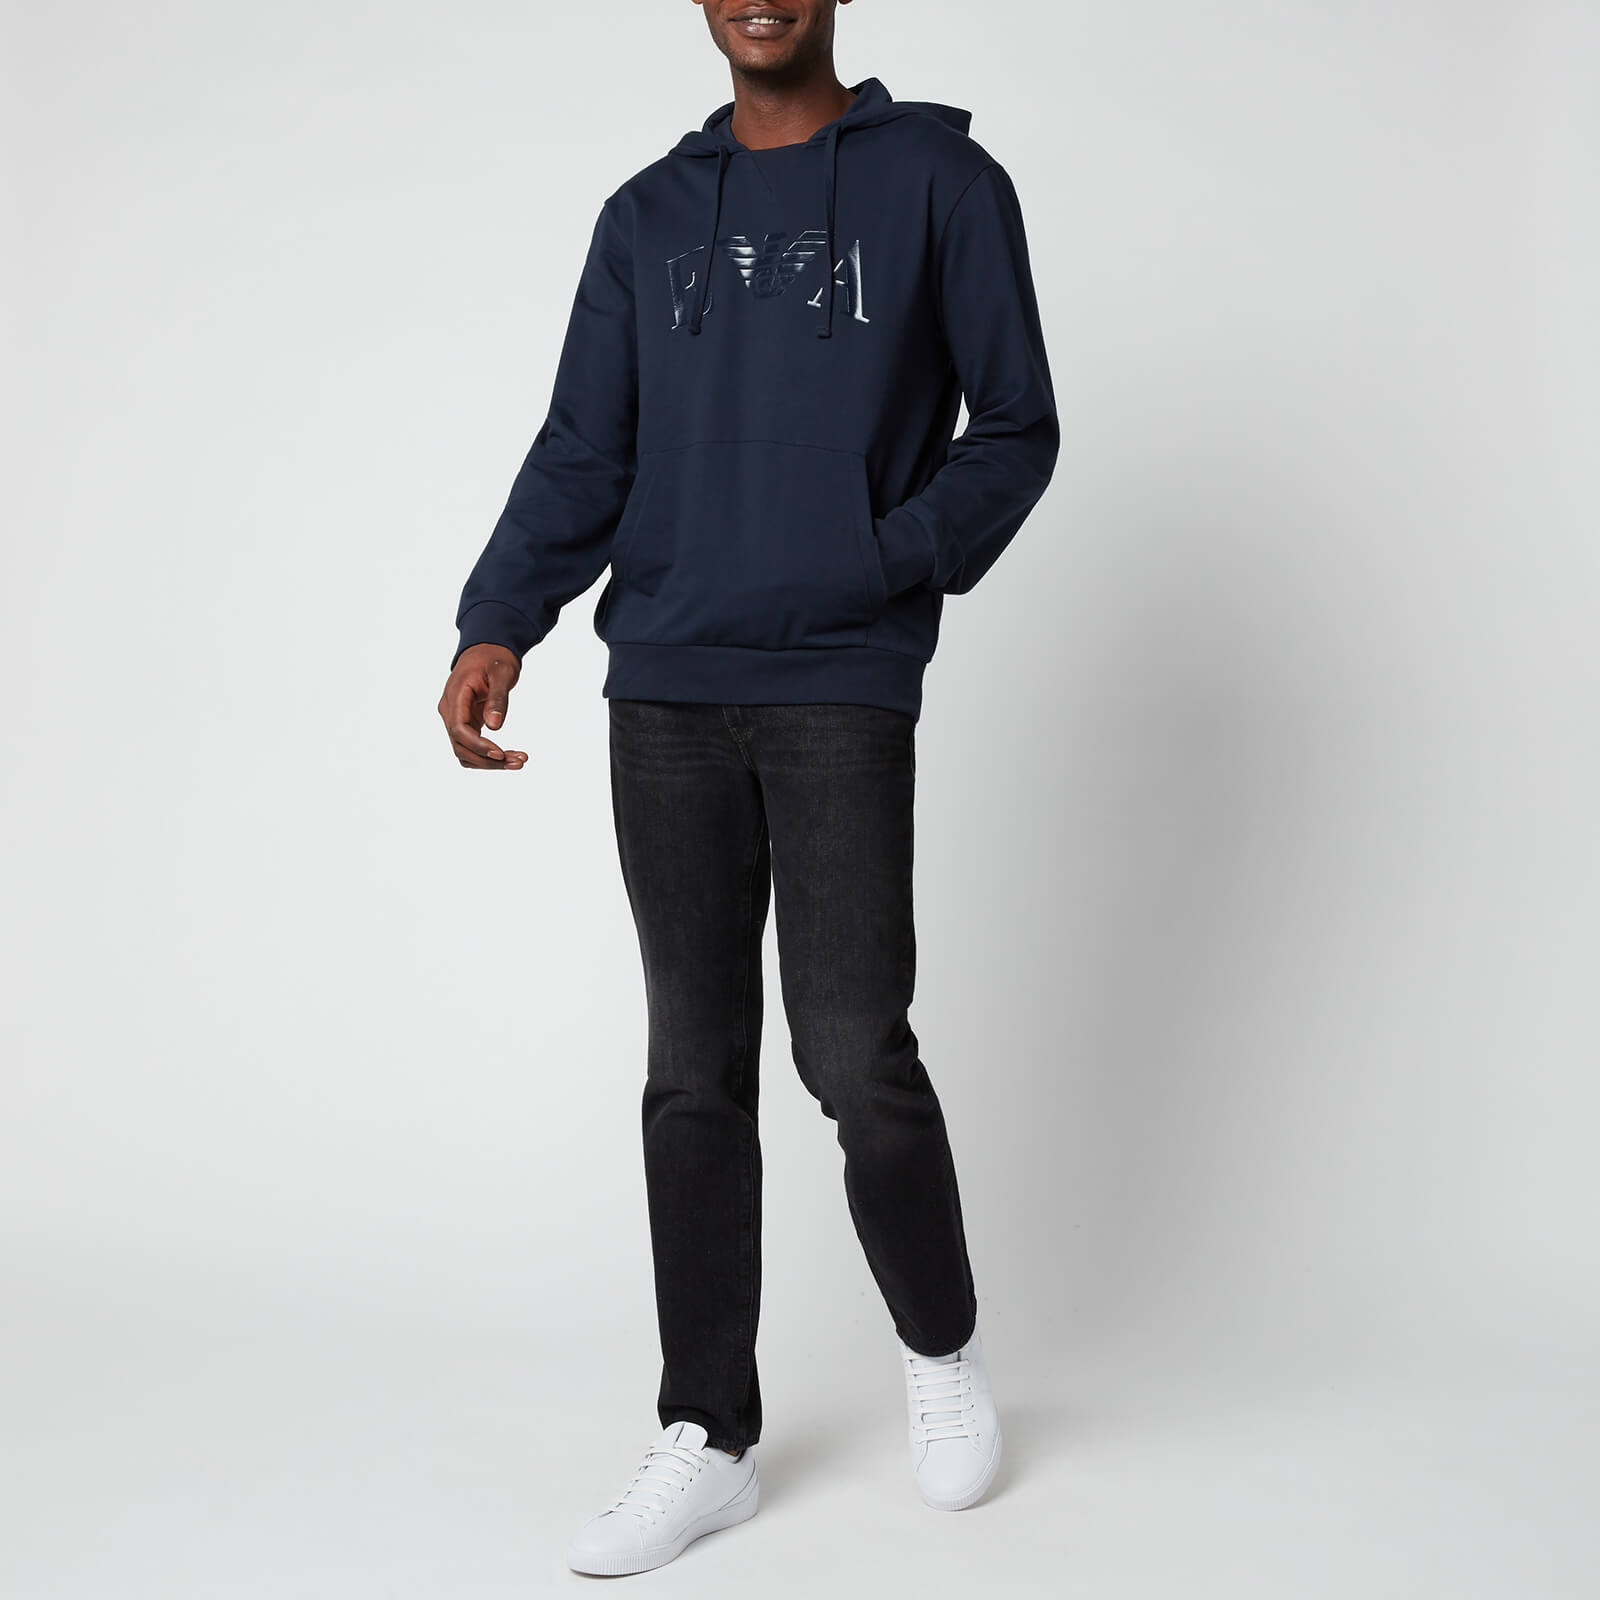 Emporio Armani Men's Iconic Terry Hooded Sweatshirt - Blue - S